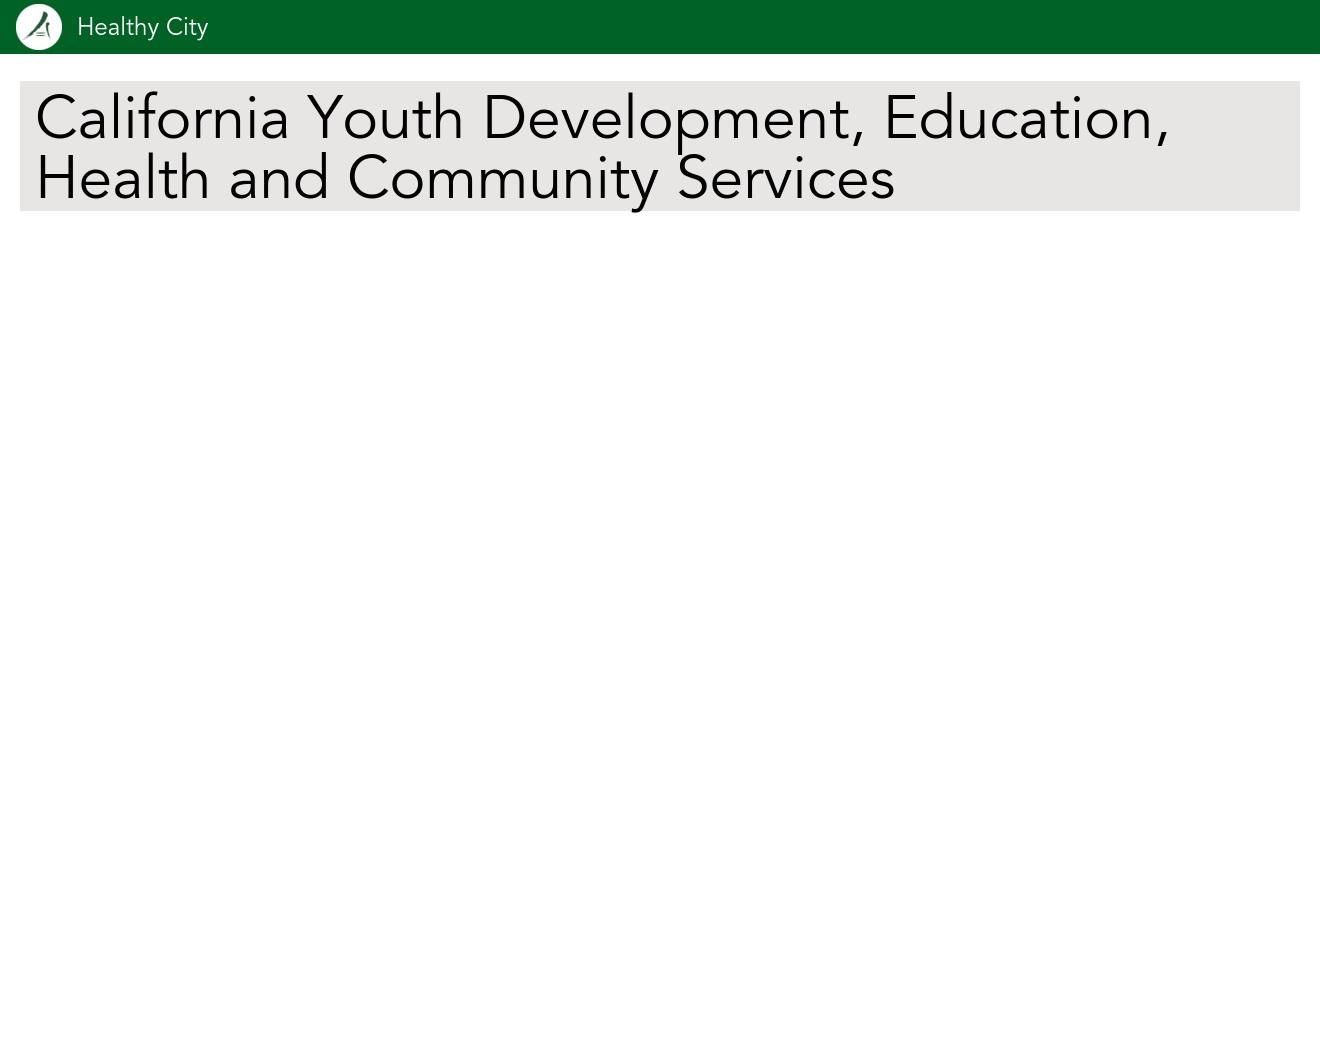 Healthy City Maps - California Youth Development, Education